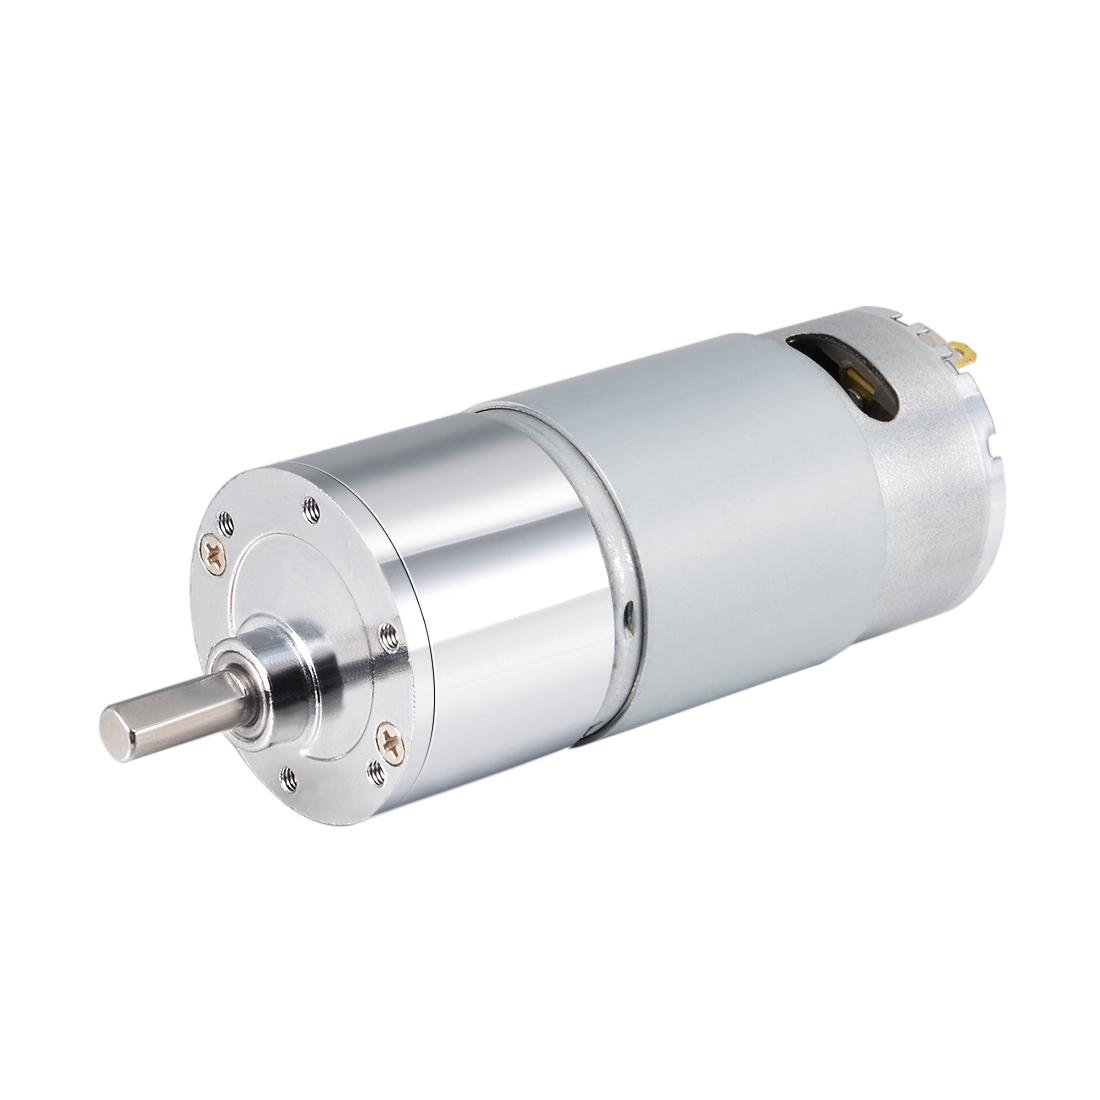 24V DC 1000 RPM Gear Motor High Torque Reduction Gearbox Eccentric Output Shaft